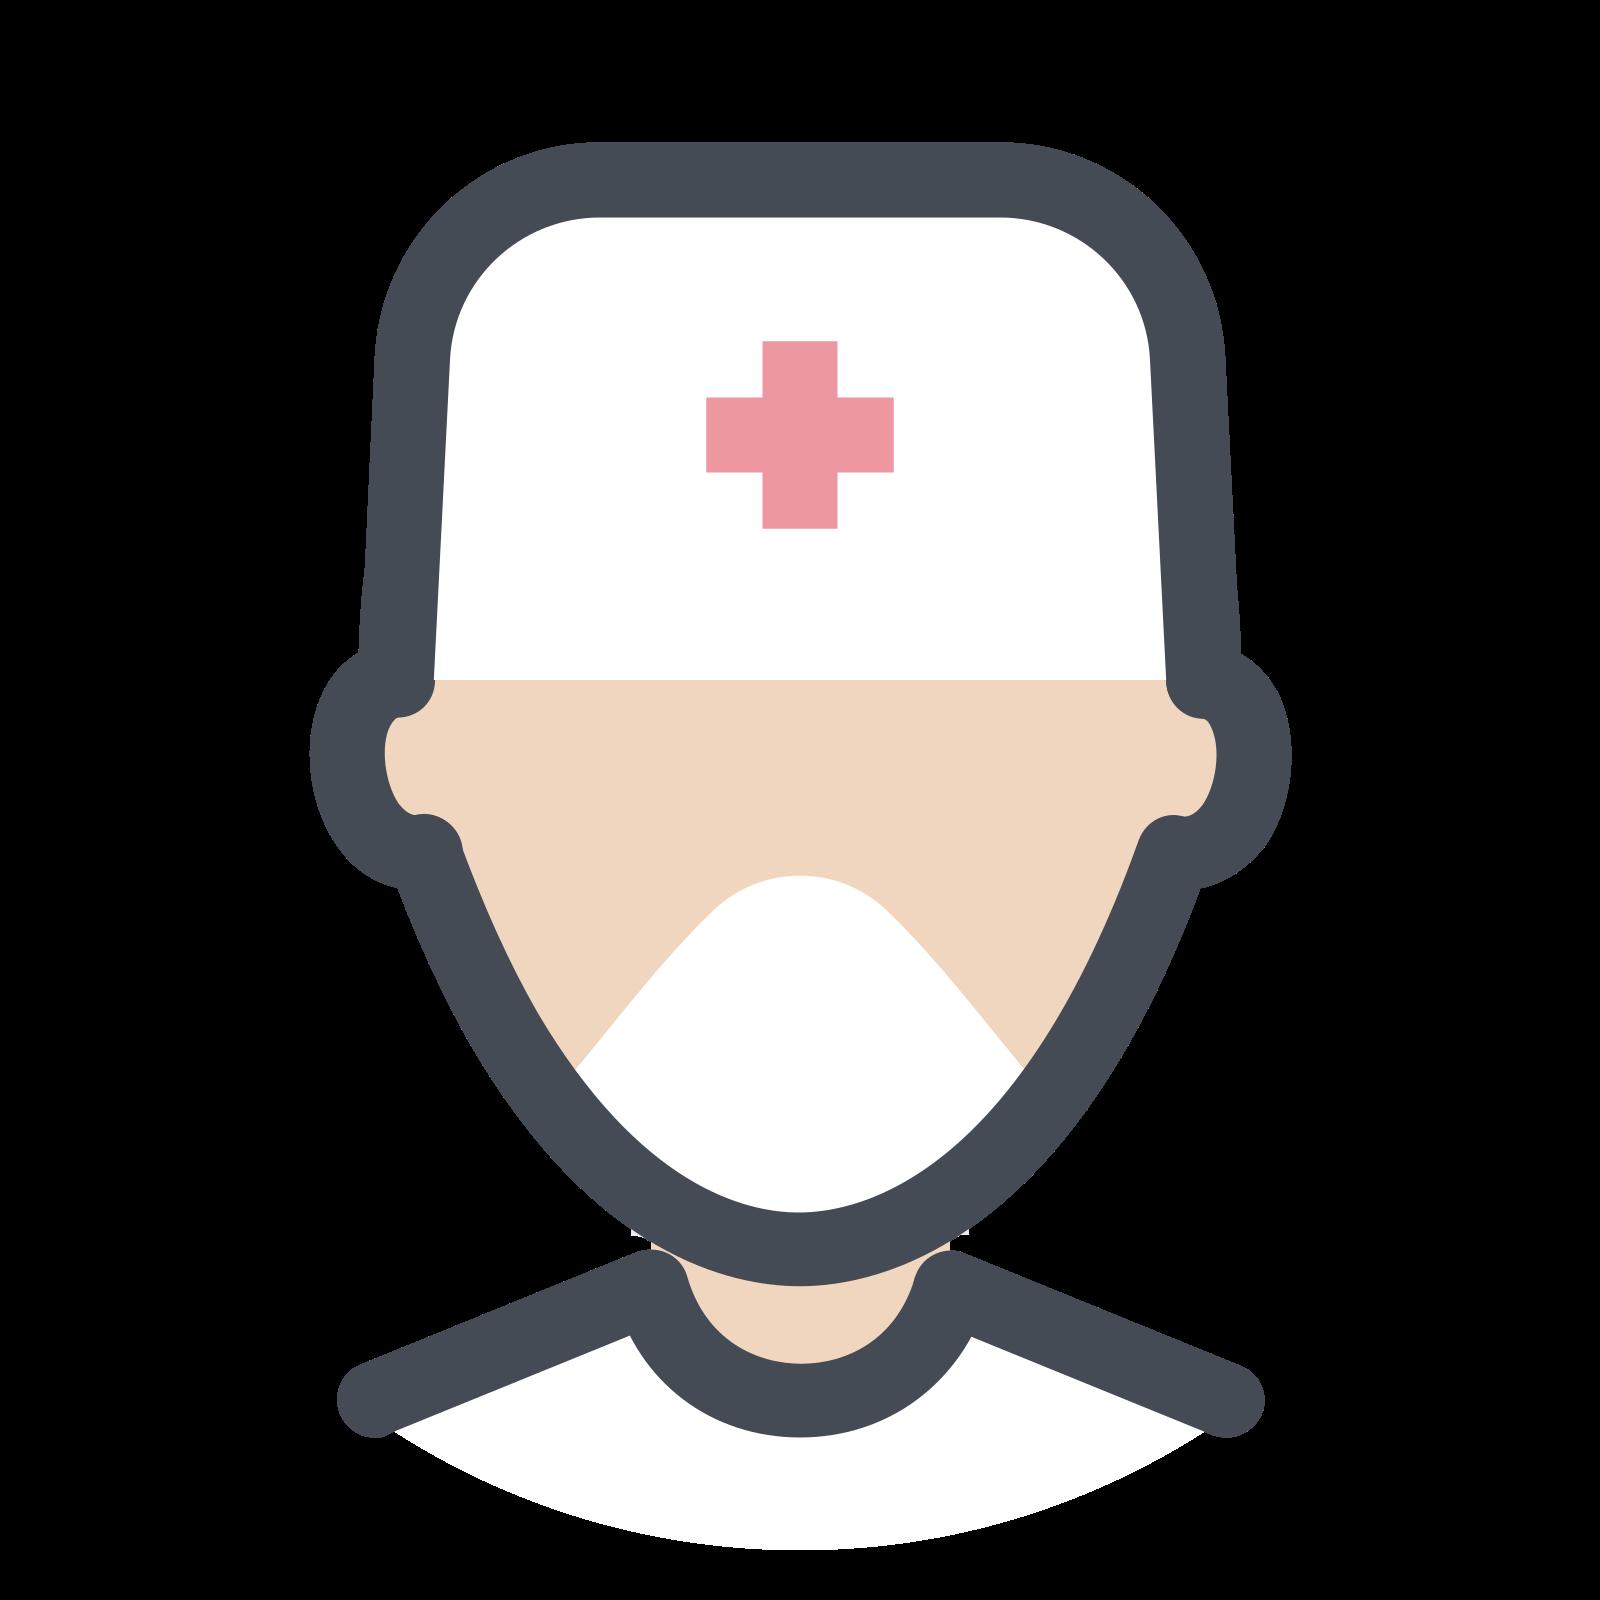 Skóra chirurga typu 1 icon